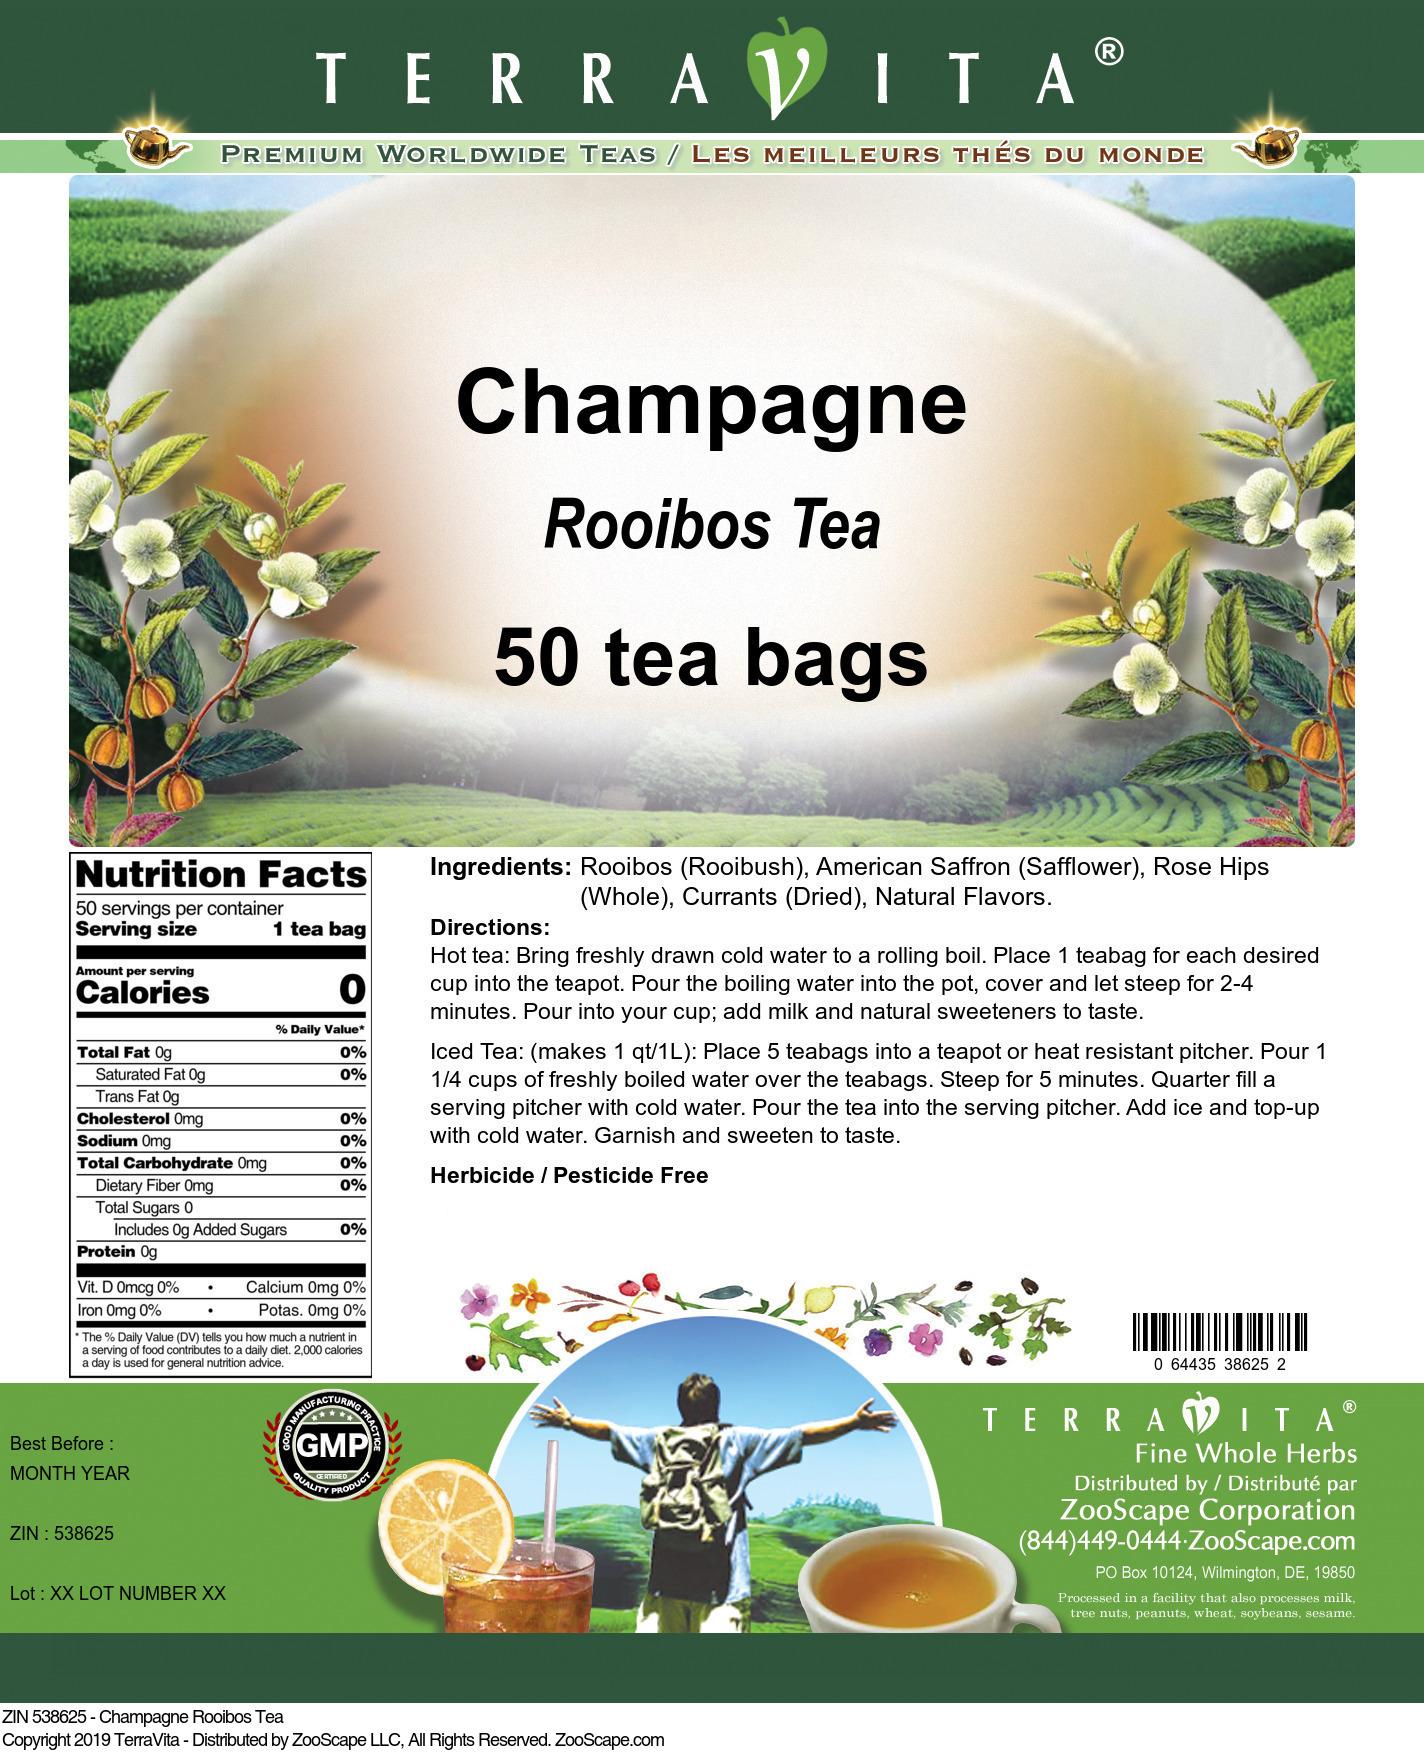 Champagne Rooibos Tea